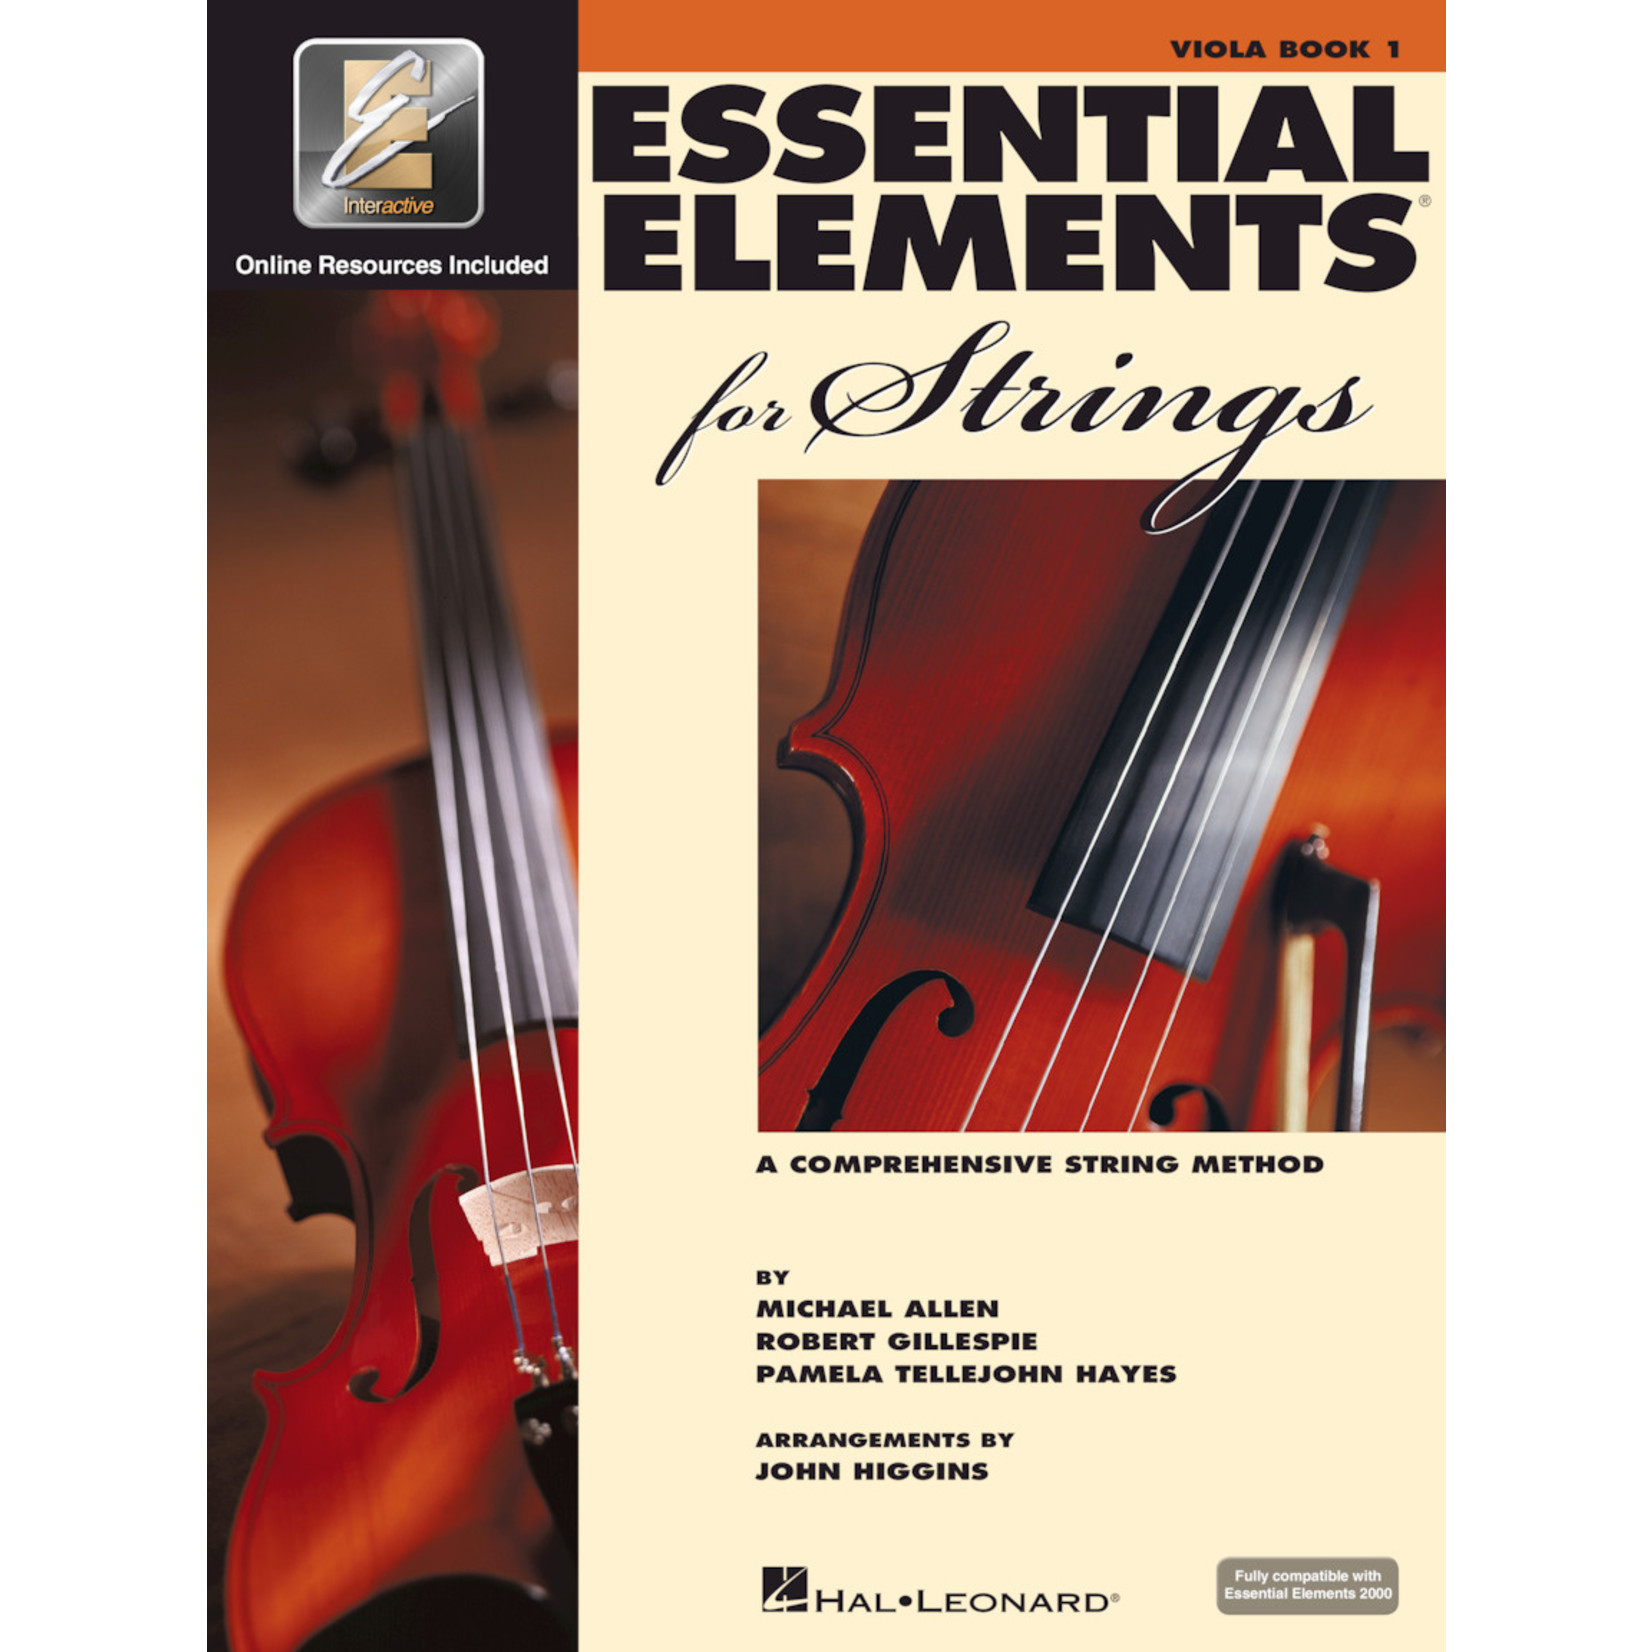 Hal Leonard Essential Elements for Strings Viola Book 1